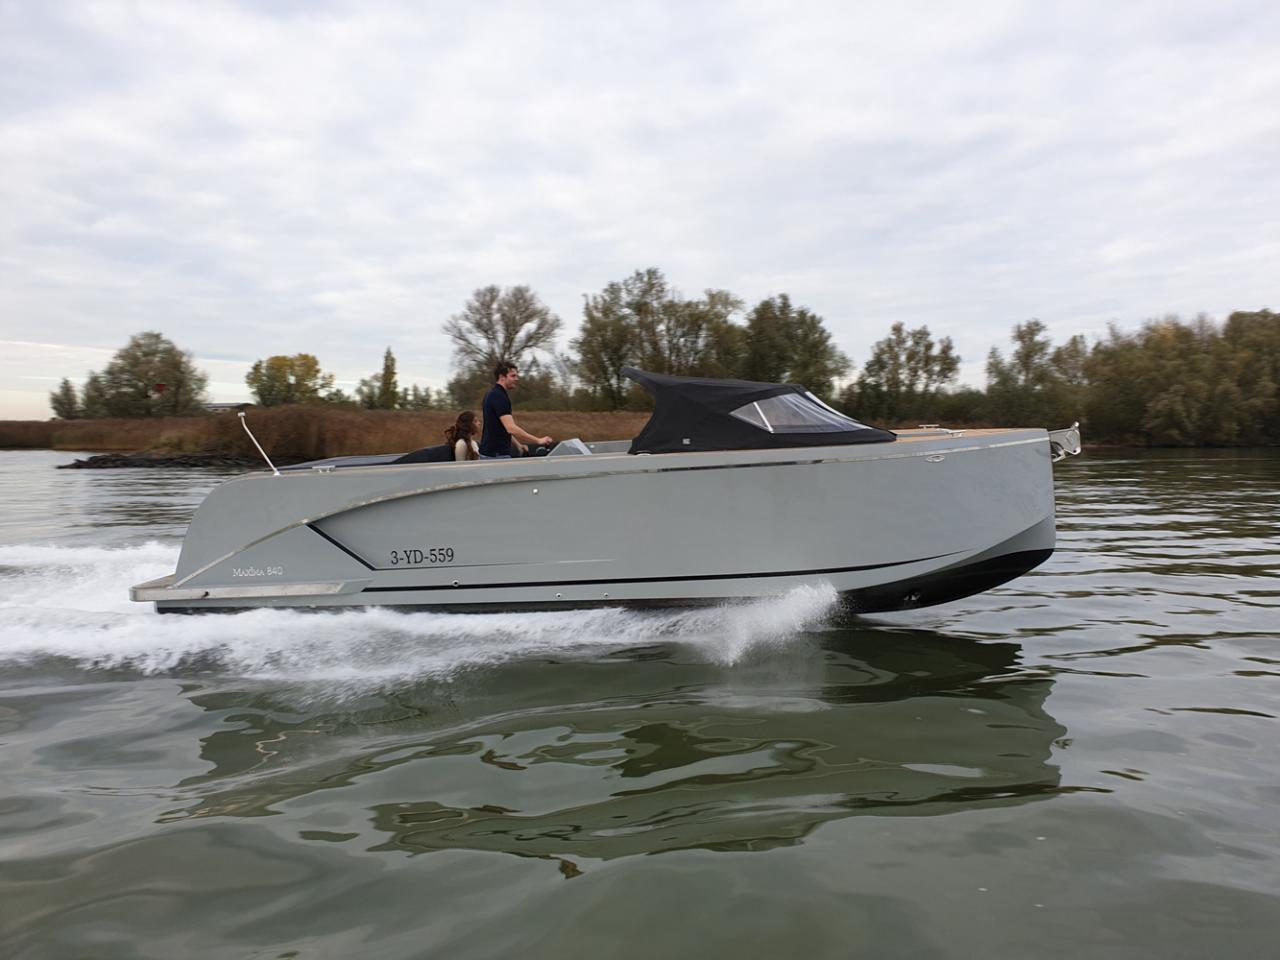 Maxima 840 tender 4